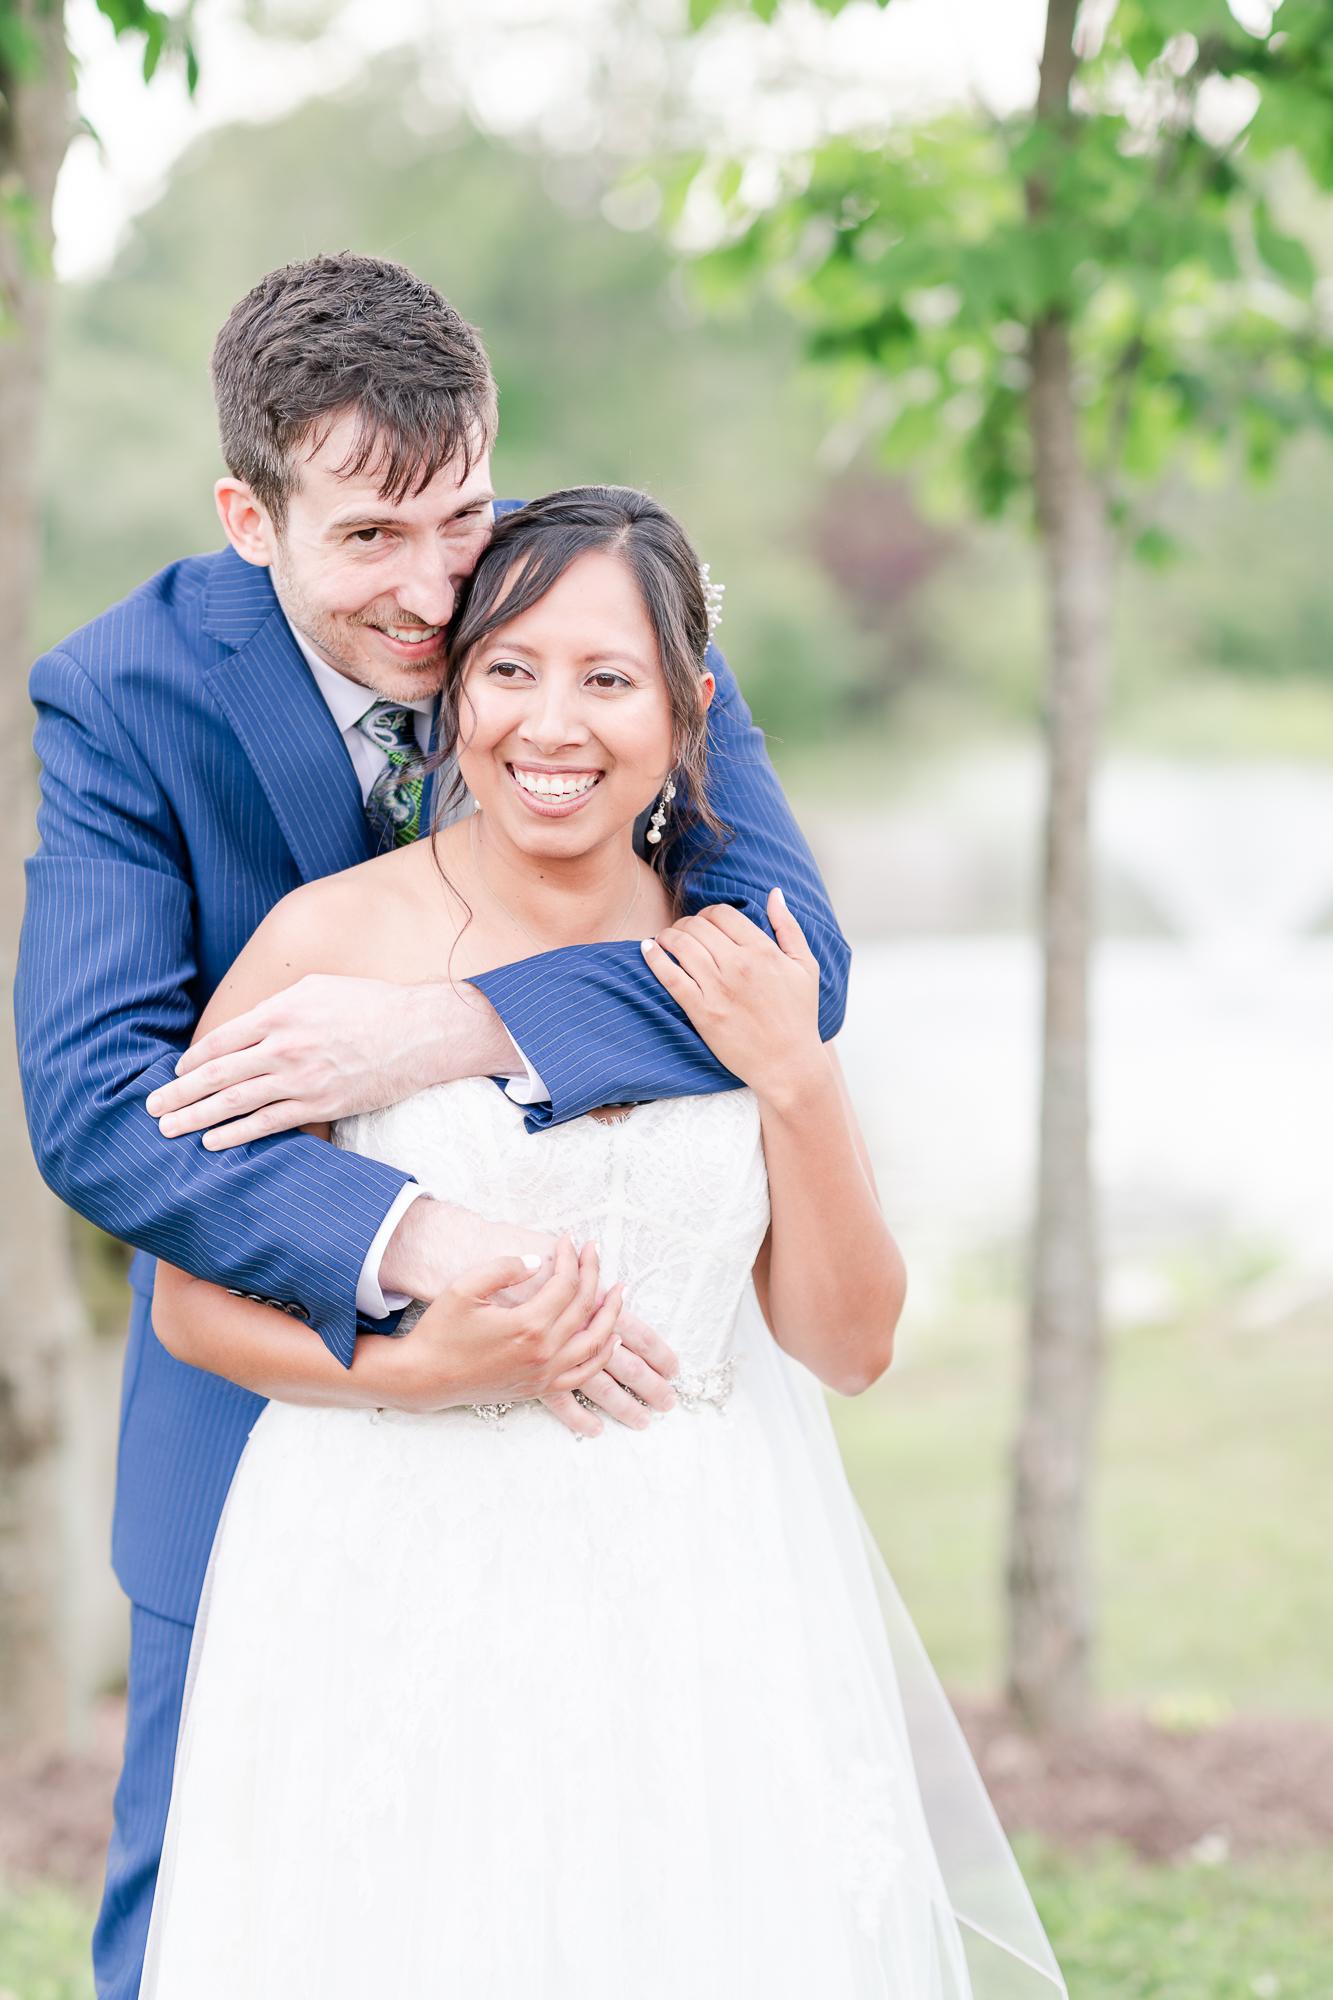 Maria+Adam_Summer Barn Wedding_The Barn and The North Star Preserve_Oberlin_Ohio-119.jpg